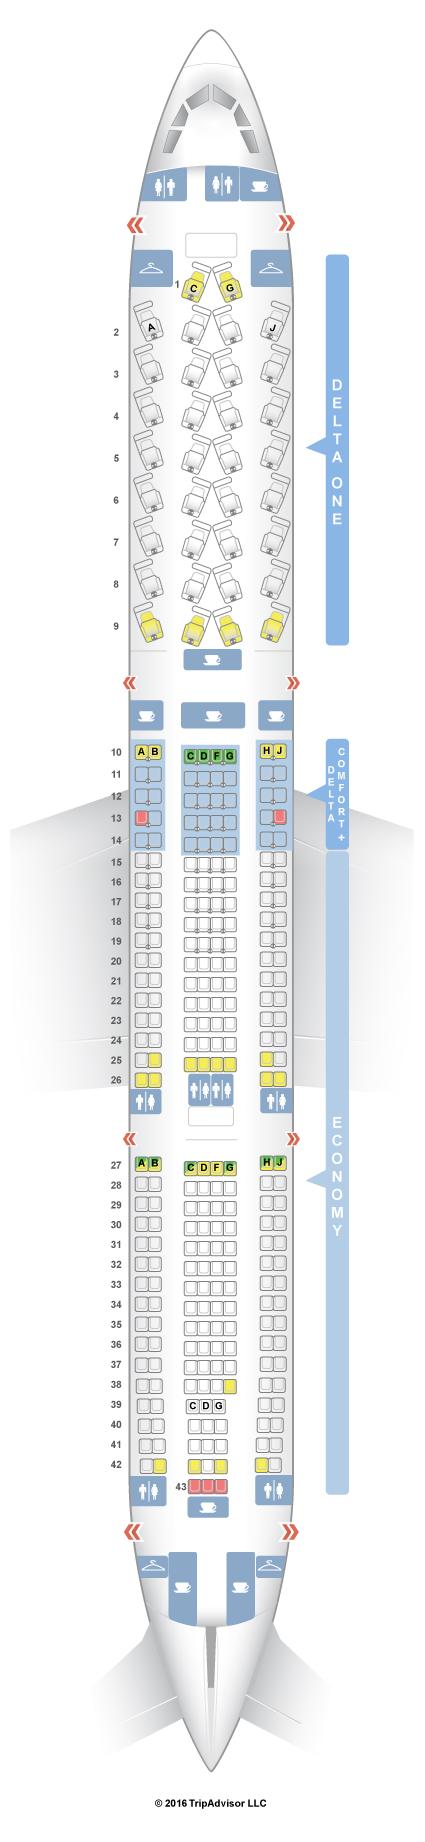 seatguru seat map delta airbus a330 300 333